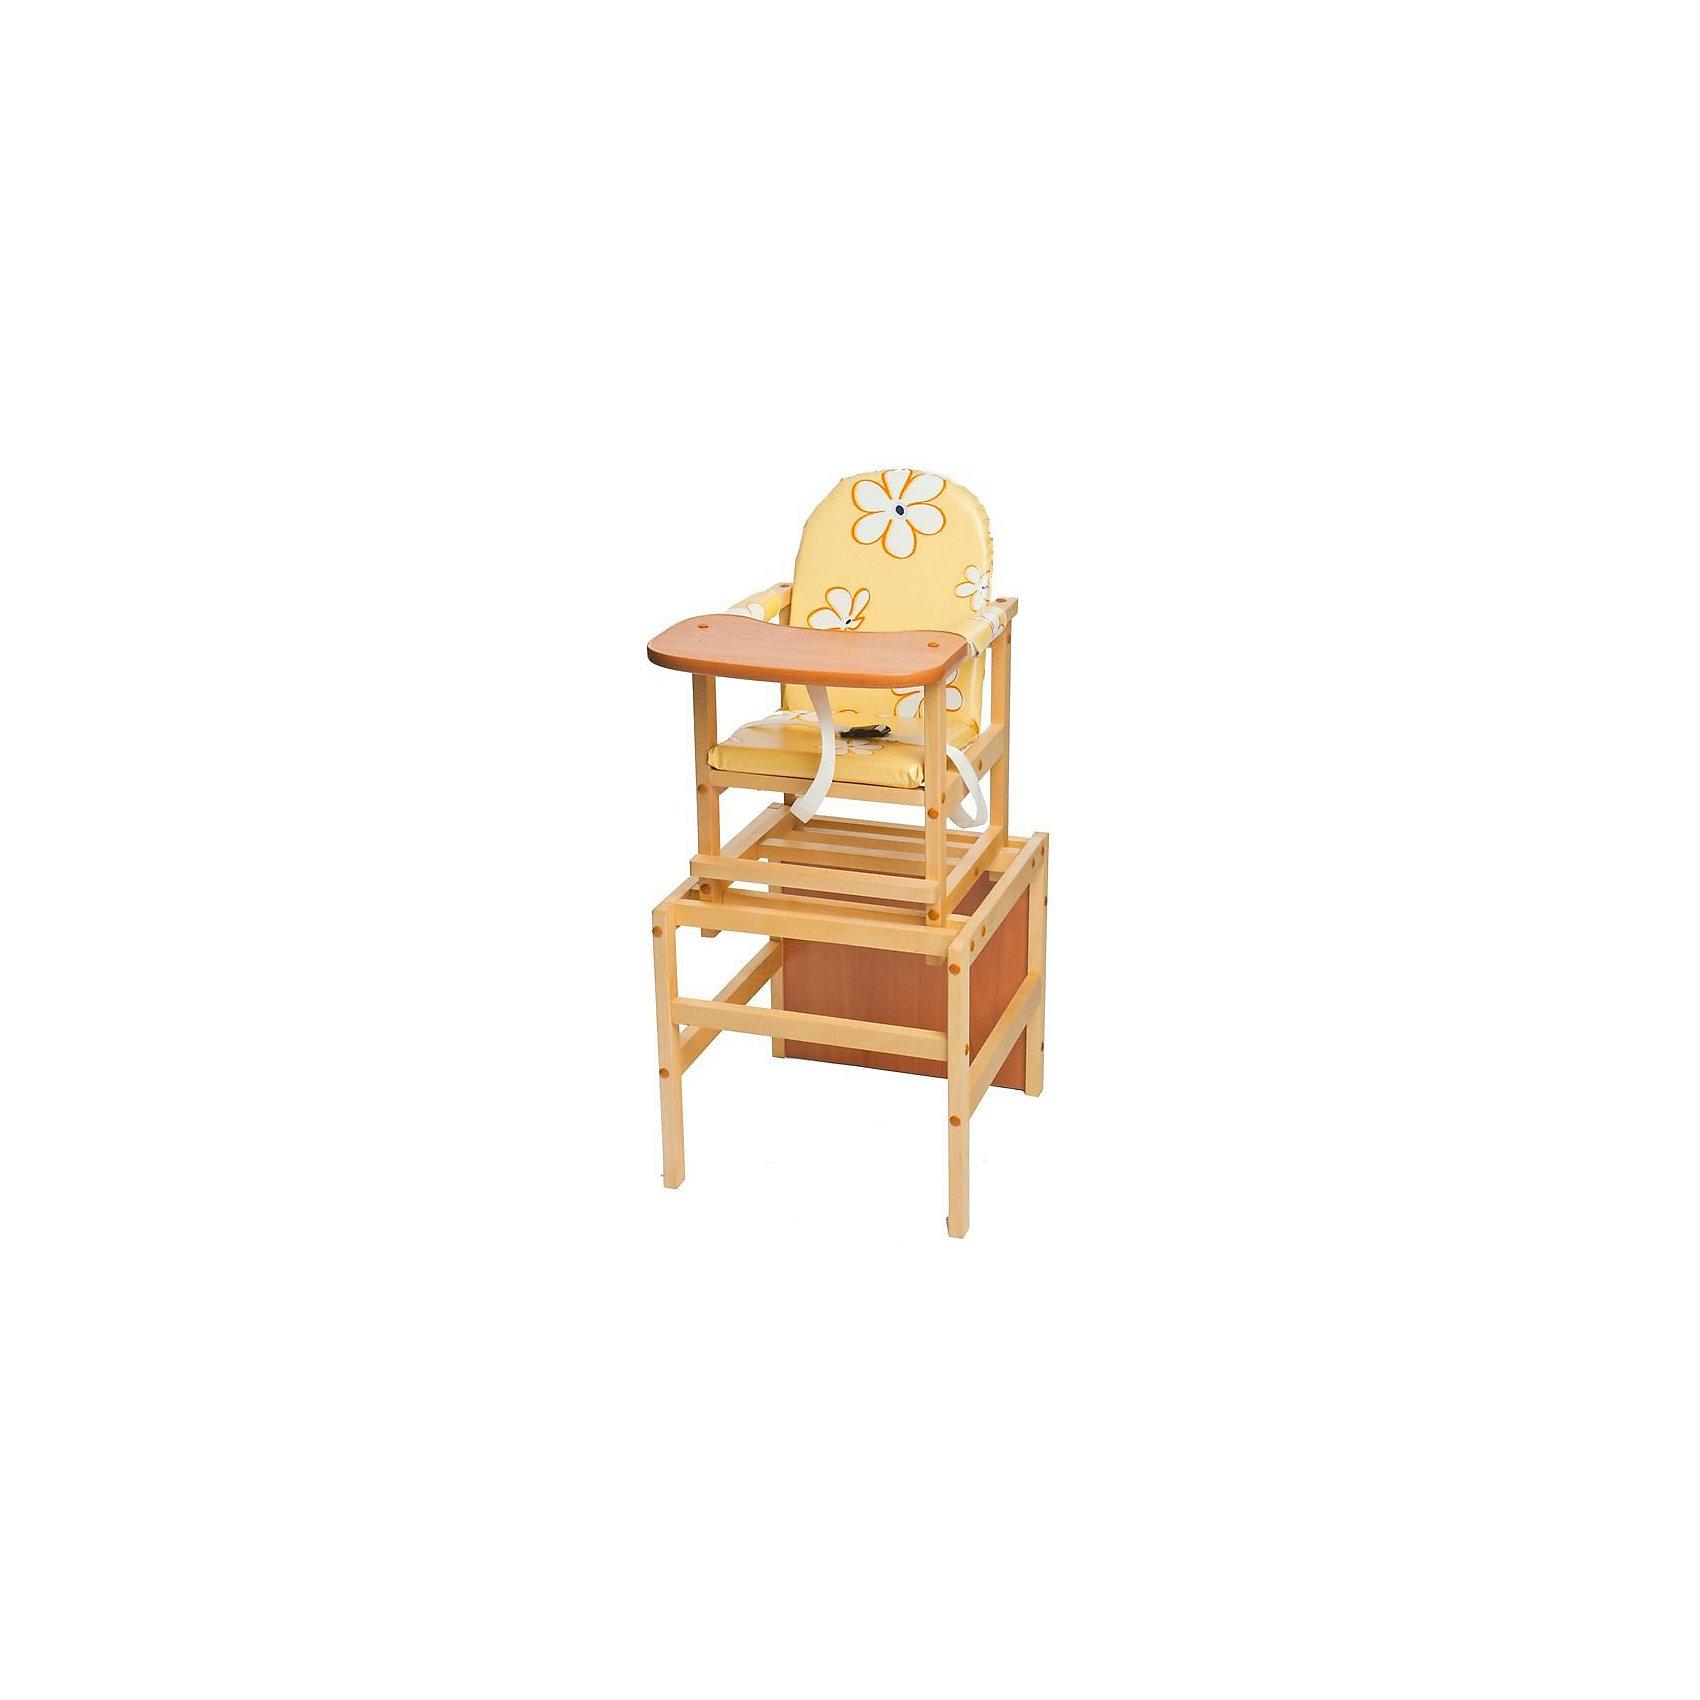 ПМДК Стульчик-трансформер Октябренок Ромашки, ПМДК, желтый стул пмдк октябренок ромашки violet light 00000045543